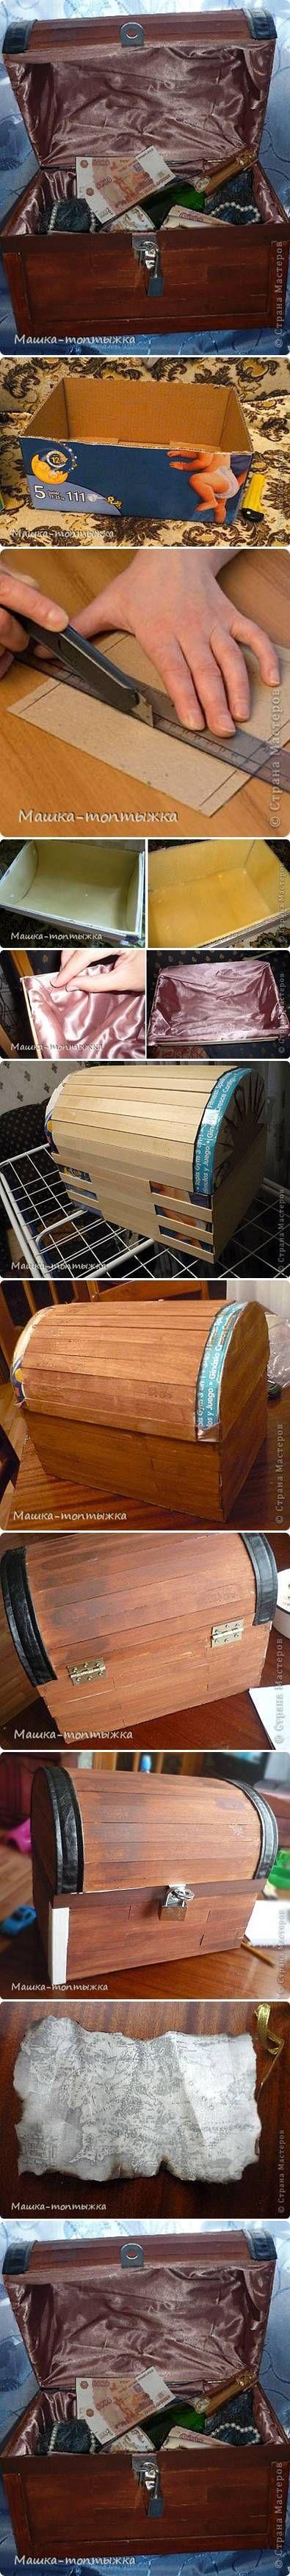 DIY Cardboard Treasure Box: